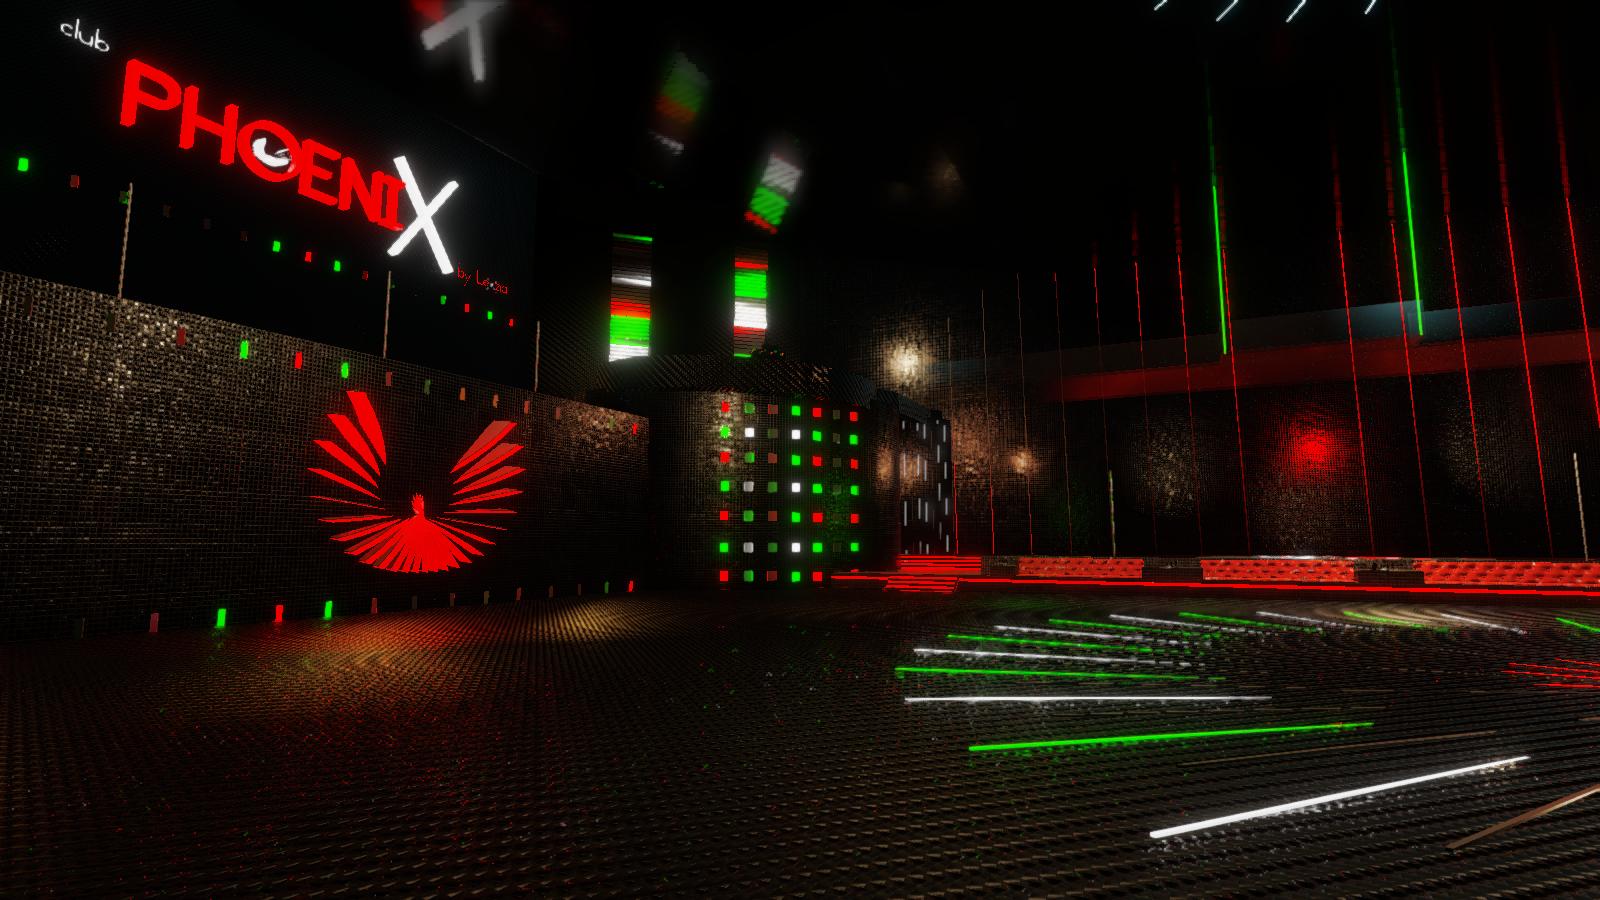 Club Phoenix 02